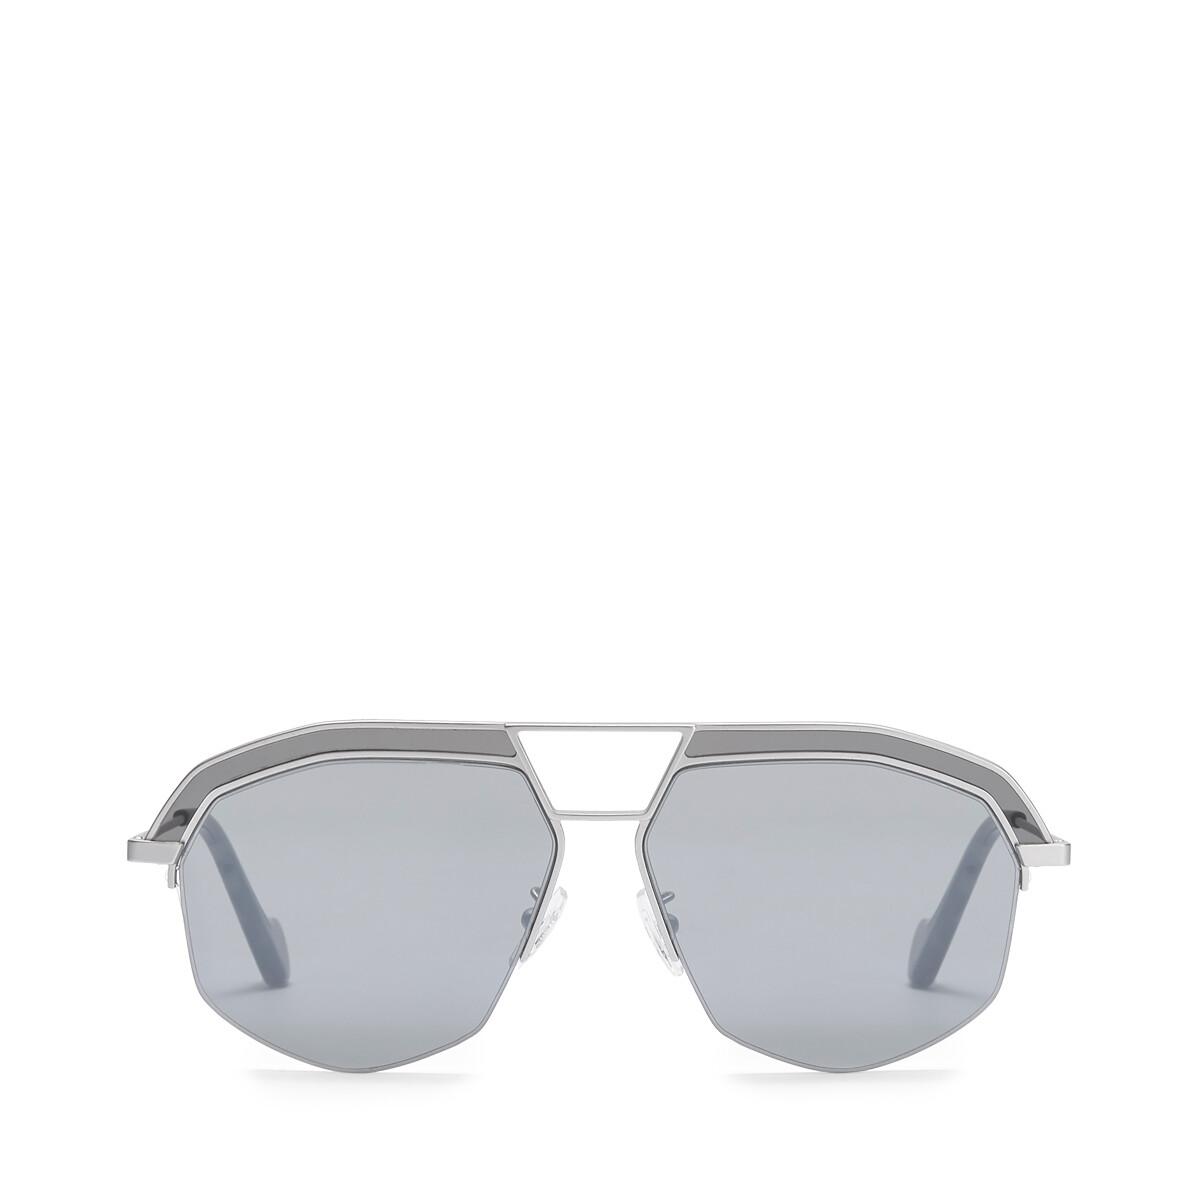 LOEWE Geometrical Sunglasses Mate Rhodium/Grey front